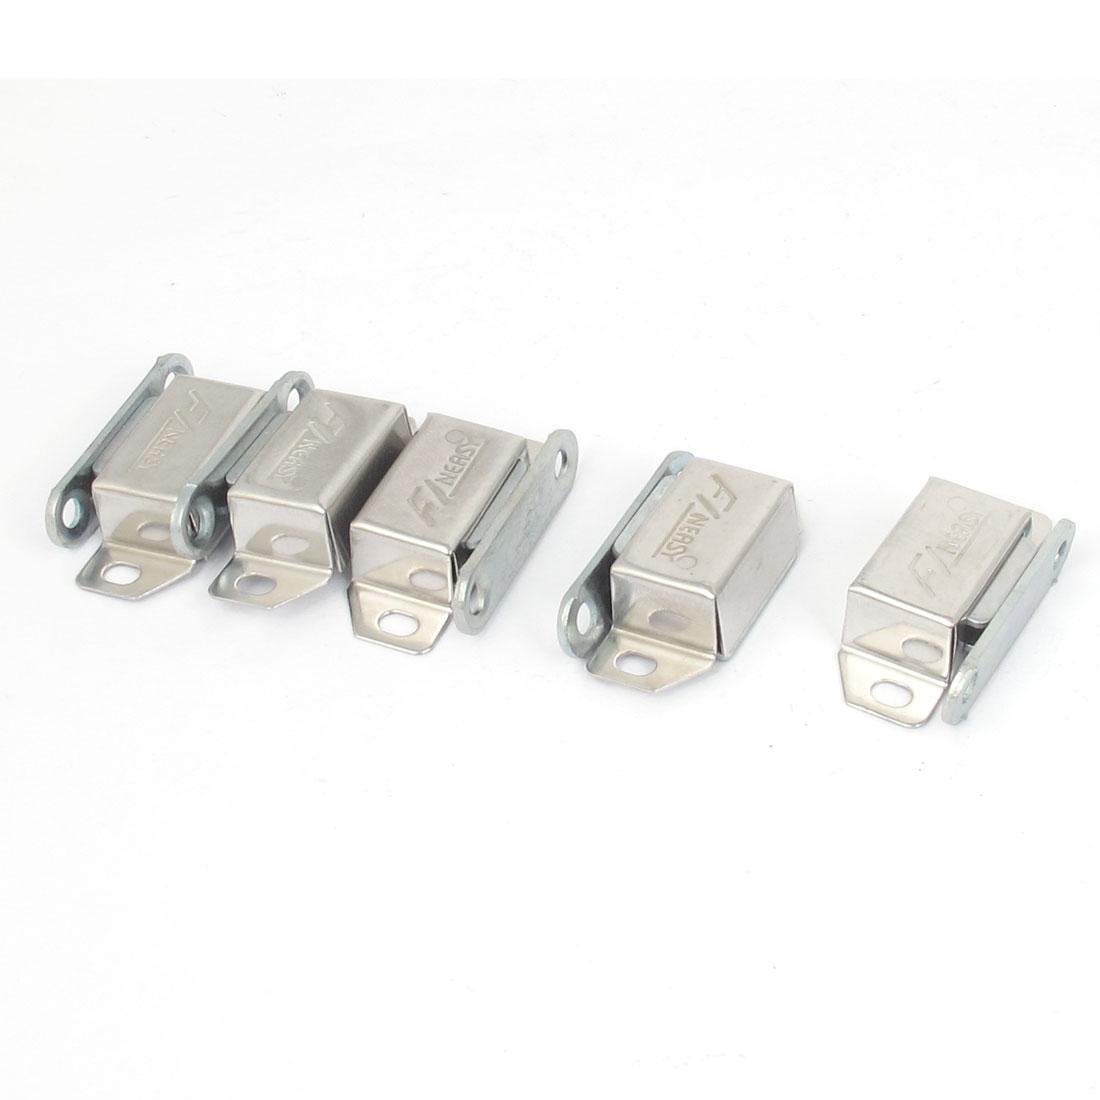 Door Cupboard Cabinet 37mm Length Magnetic Catch Latch Metal Plate 5Pcs